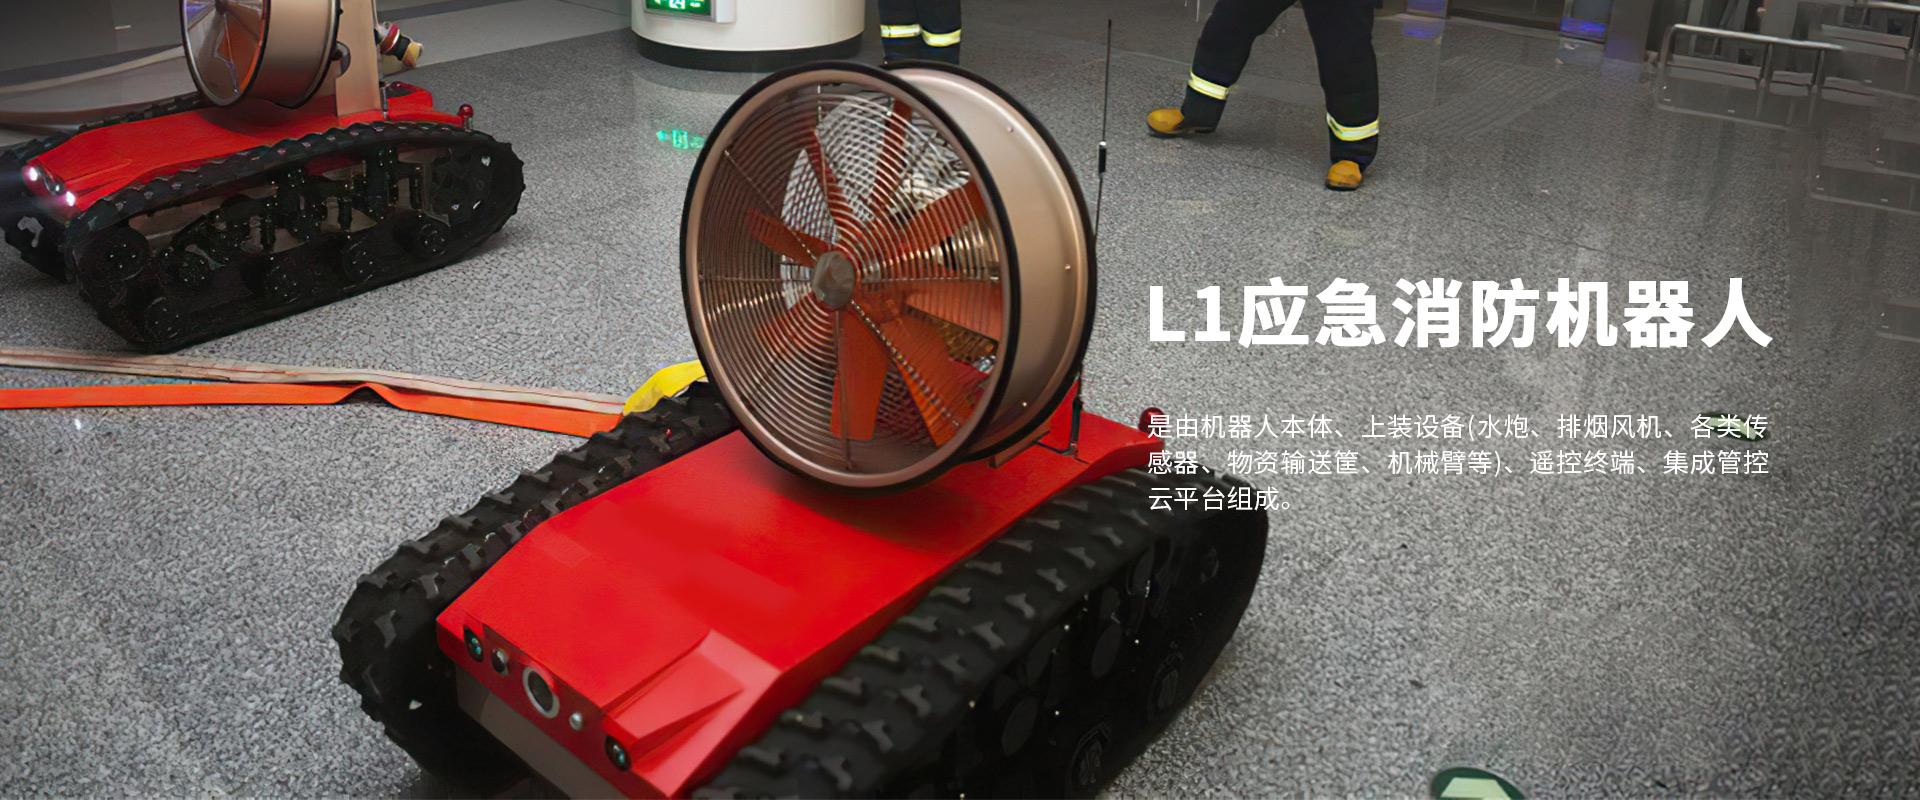 L1应急消防机器人